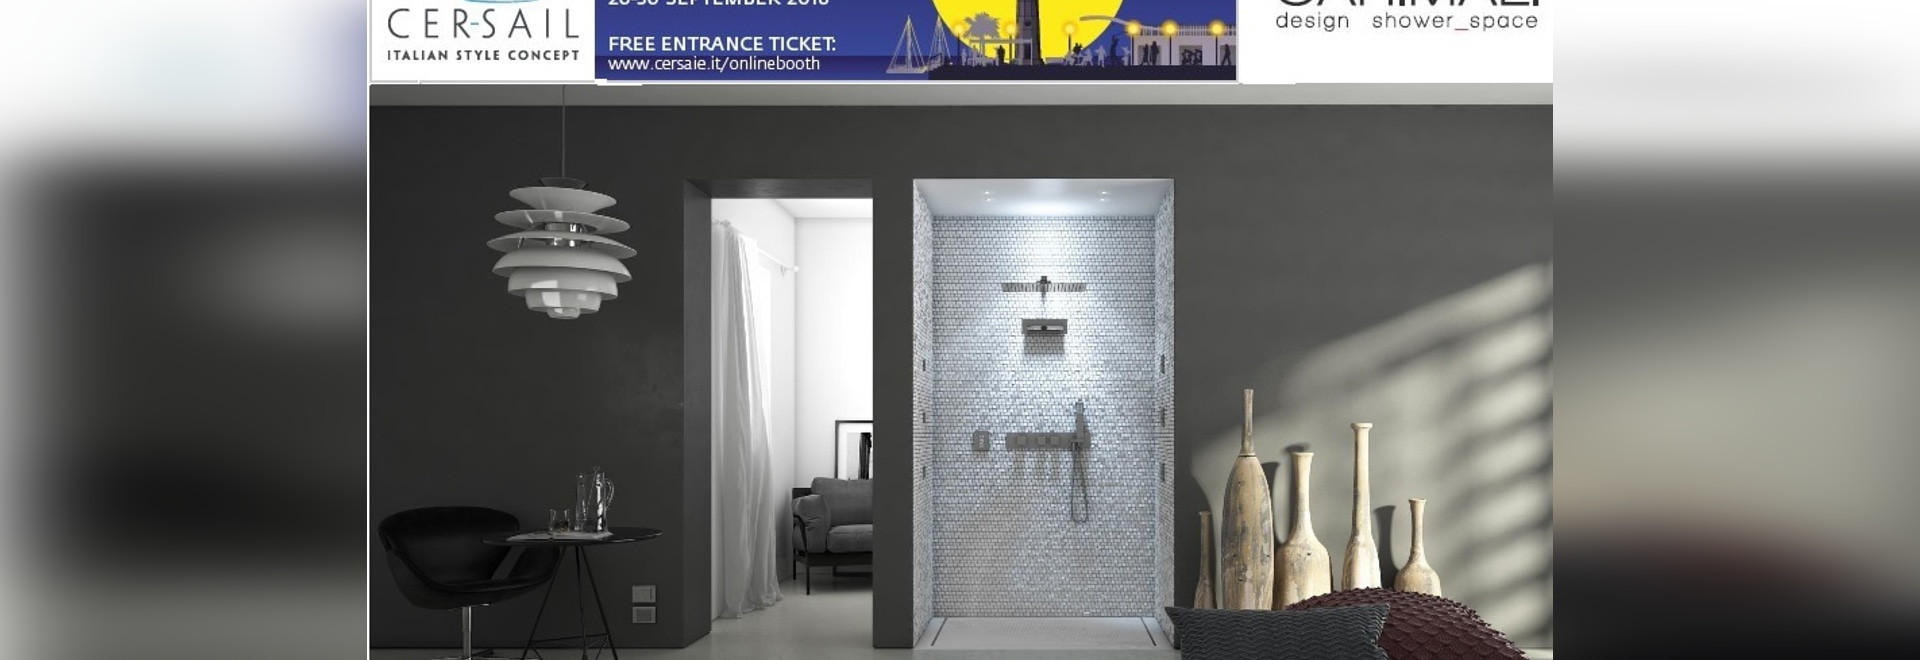 CARIMALI-Entwurf shower_space an CERSAIE 2016